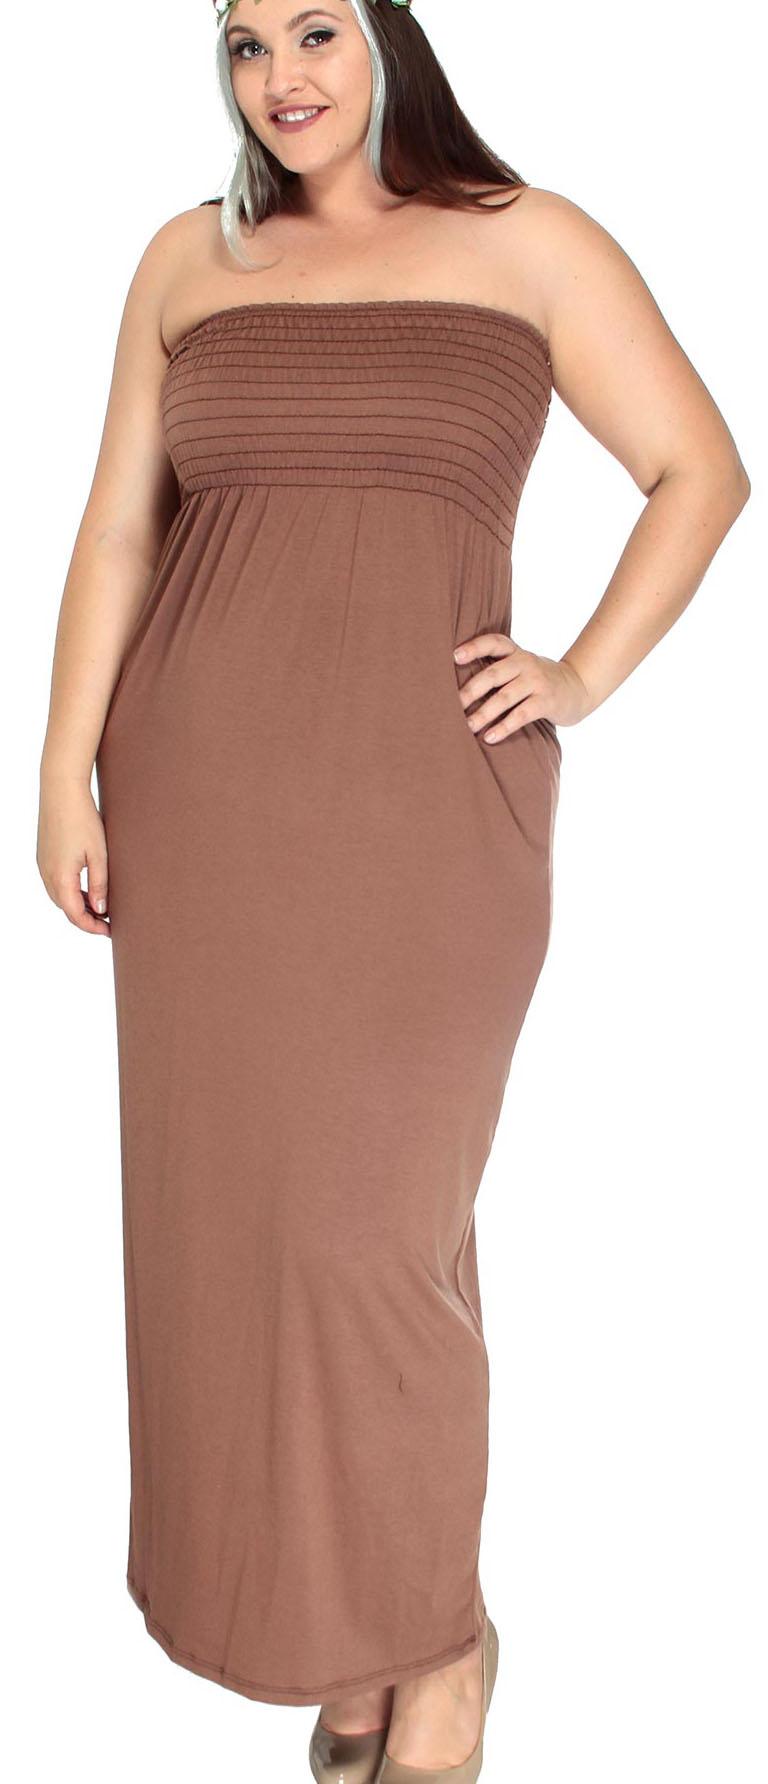 Chocolate Plus Size Dresses